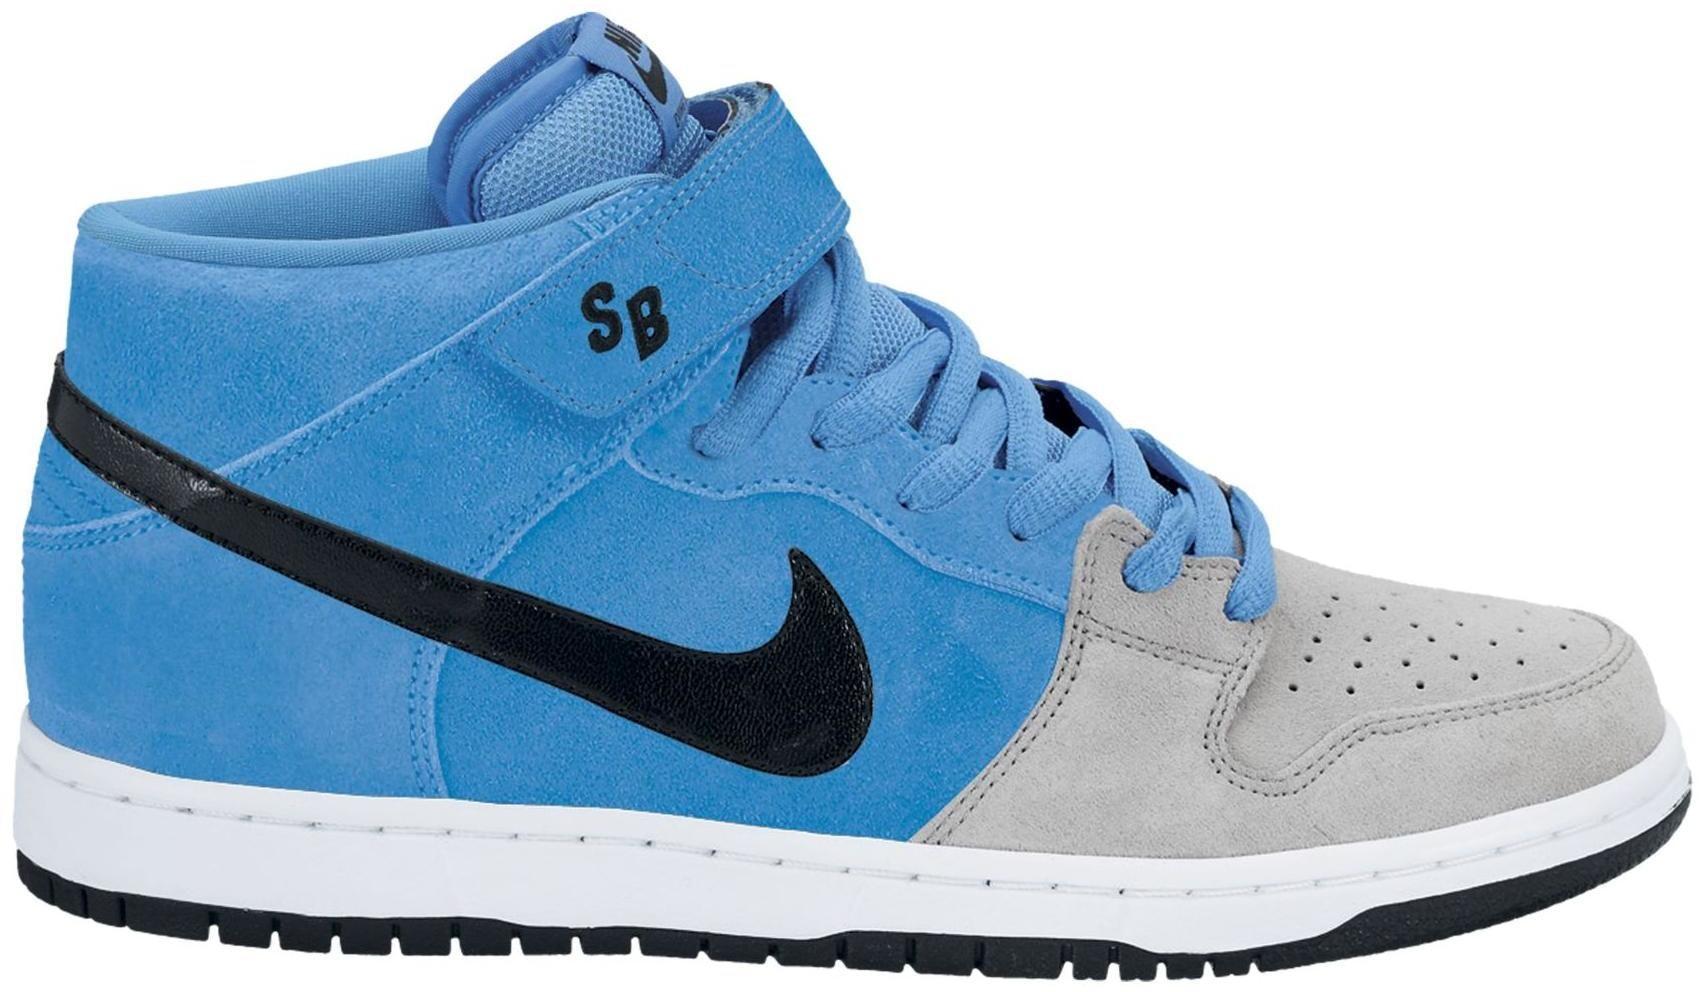 Nike Dunk SB Mid Beavis